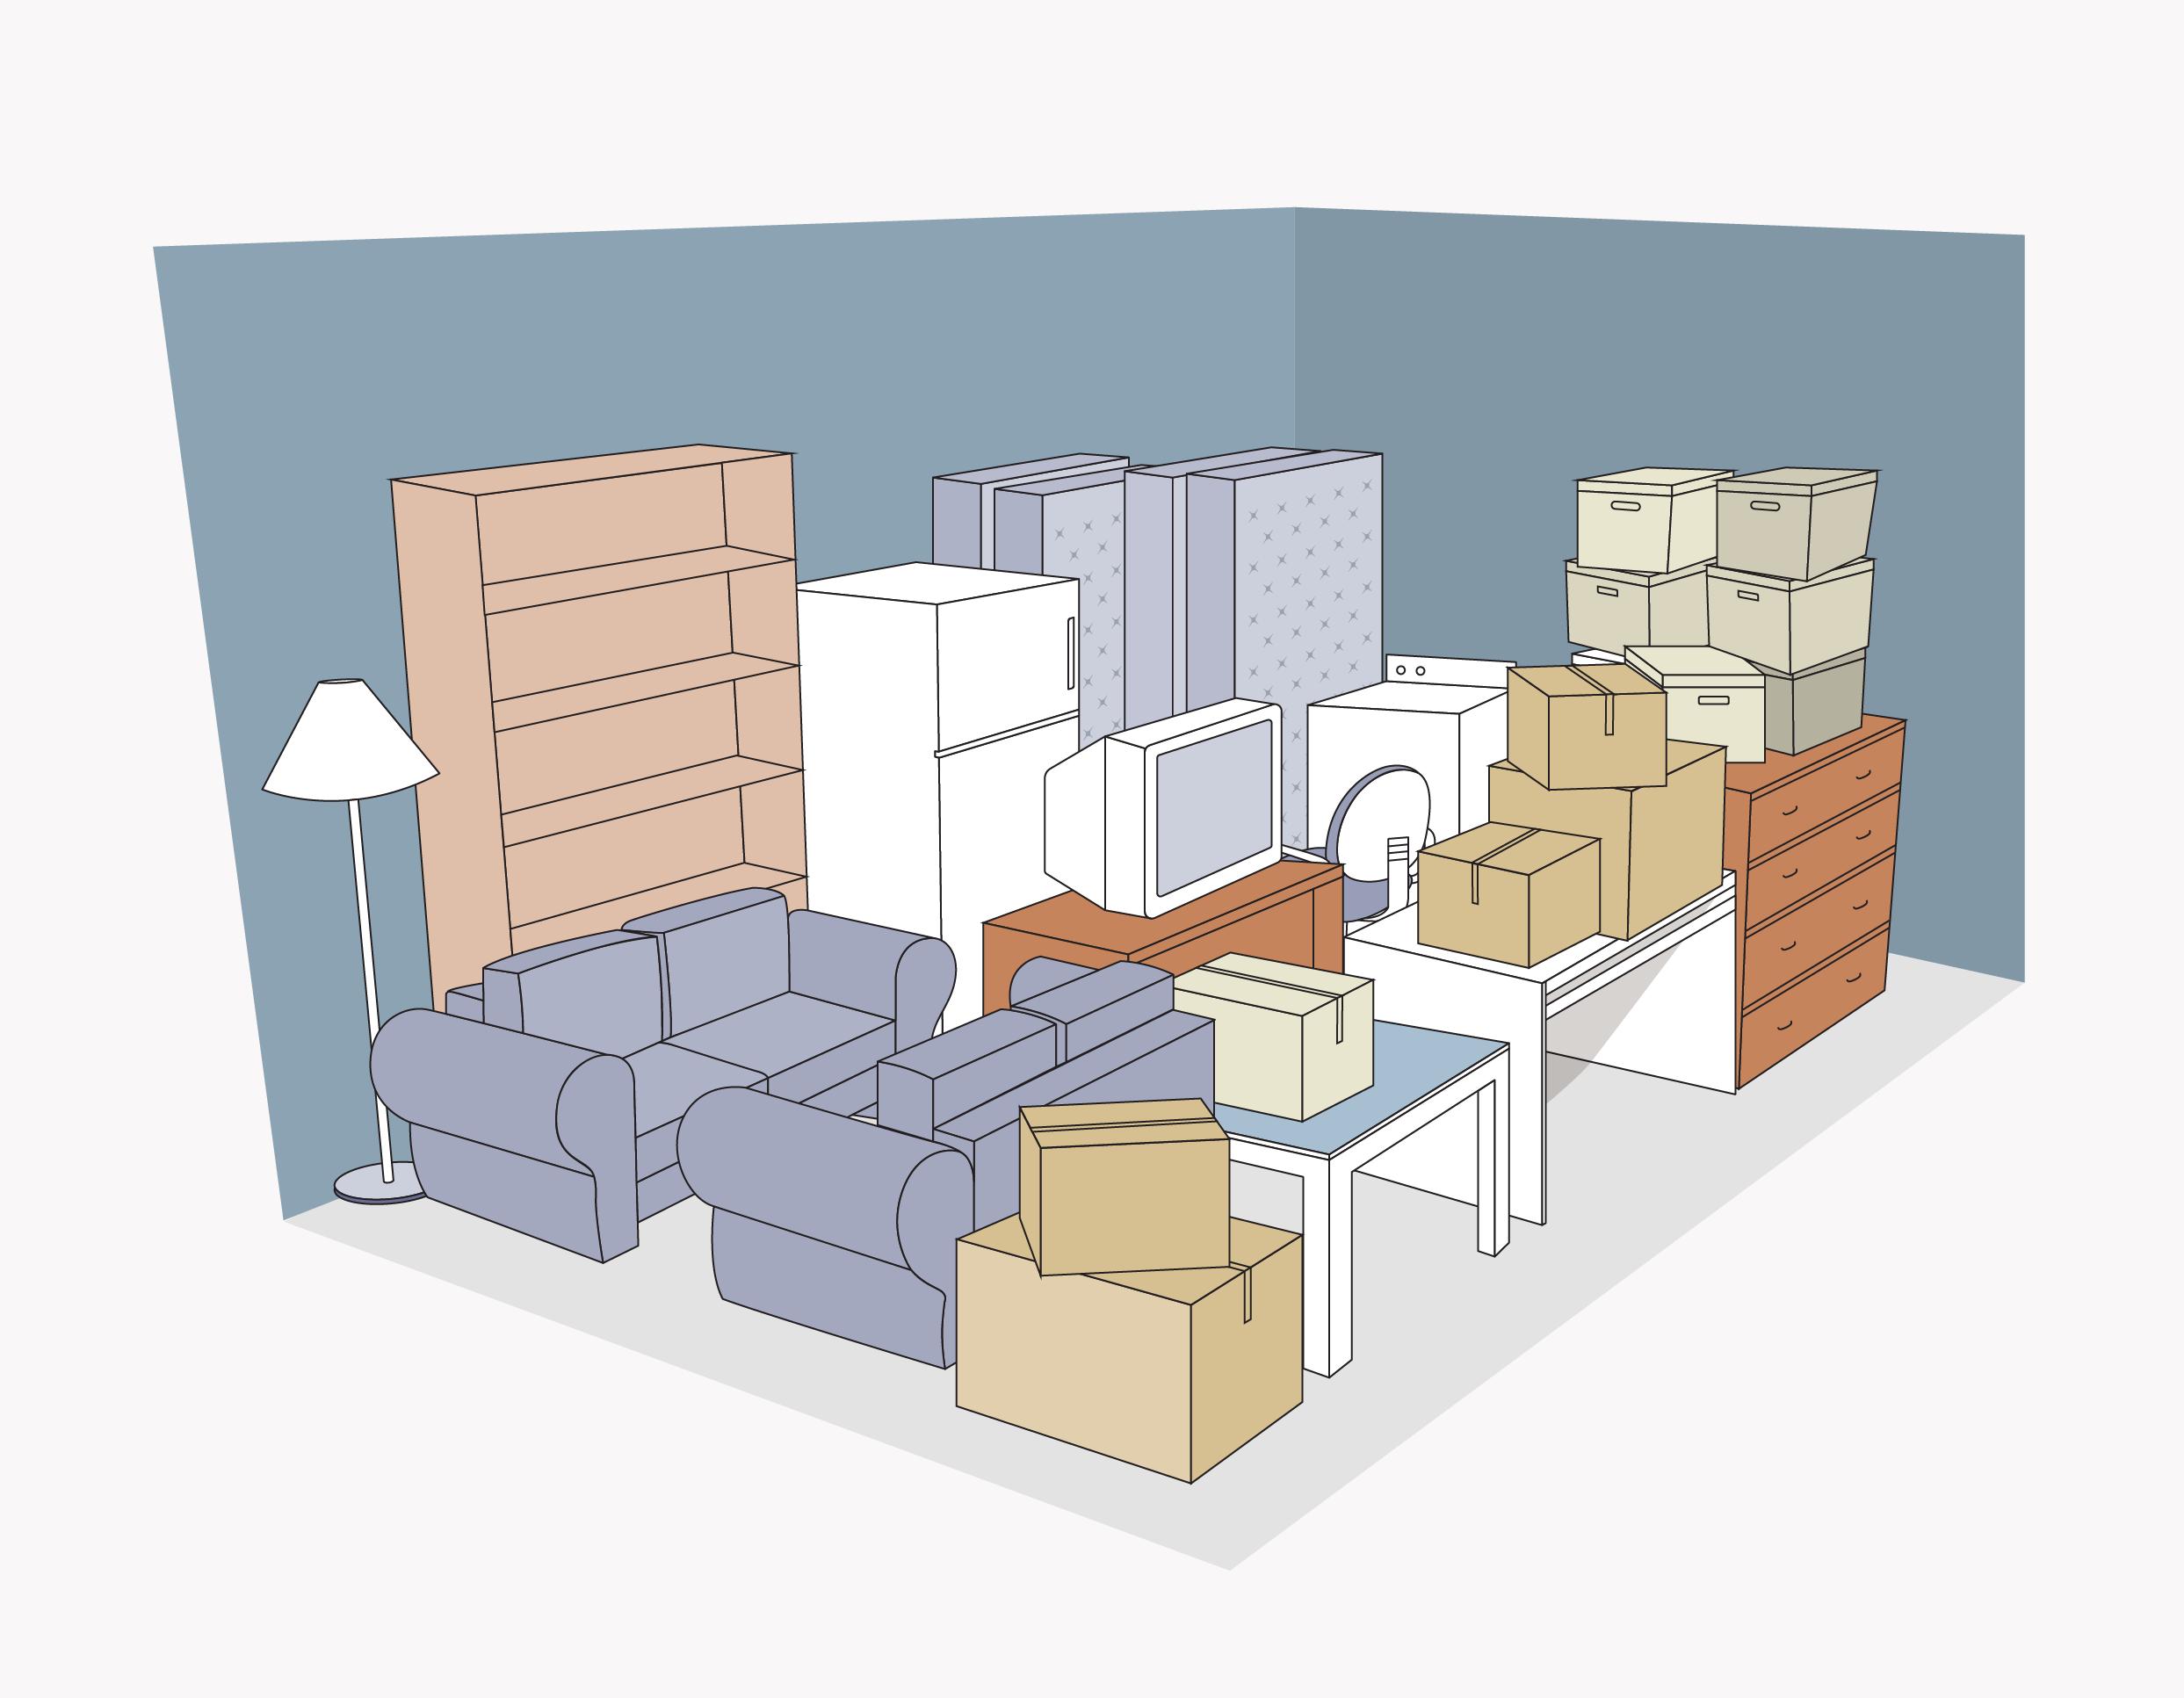 Mini Storage - 10x15